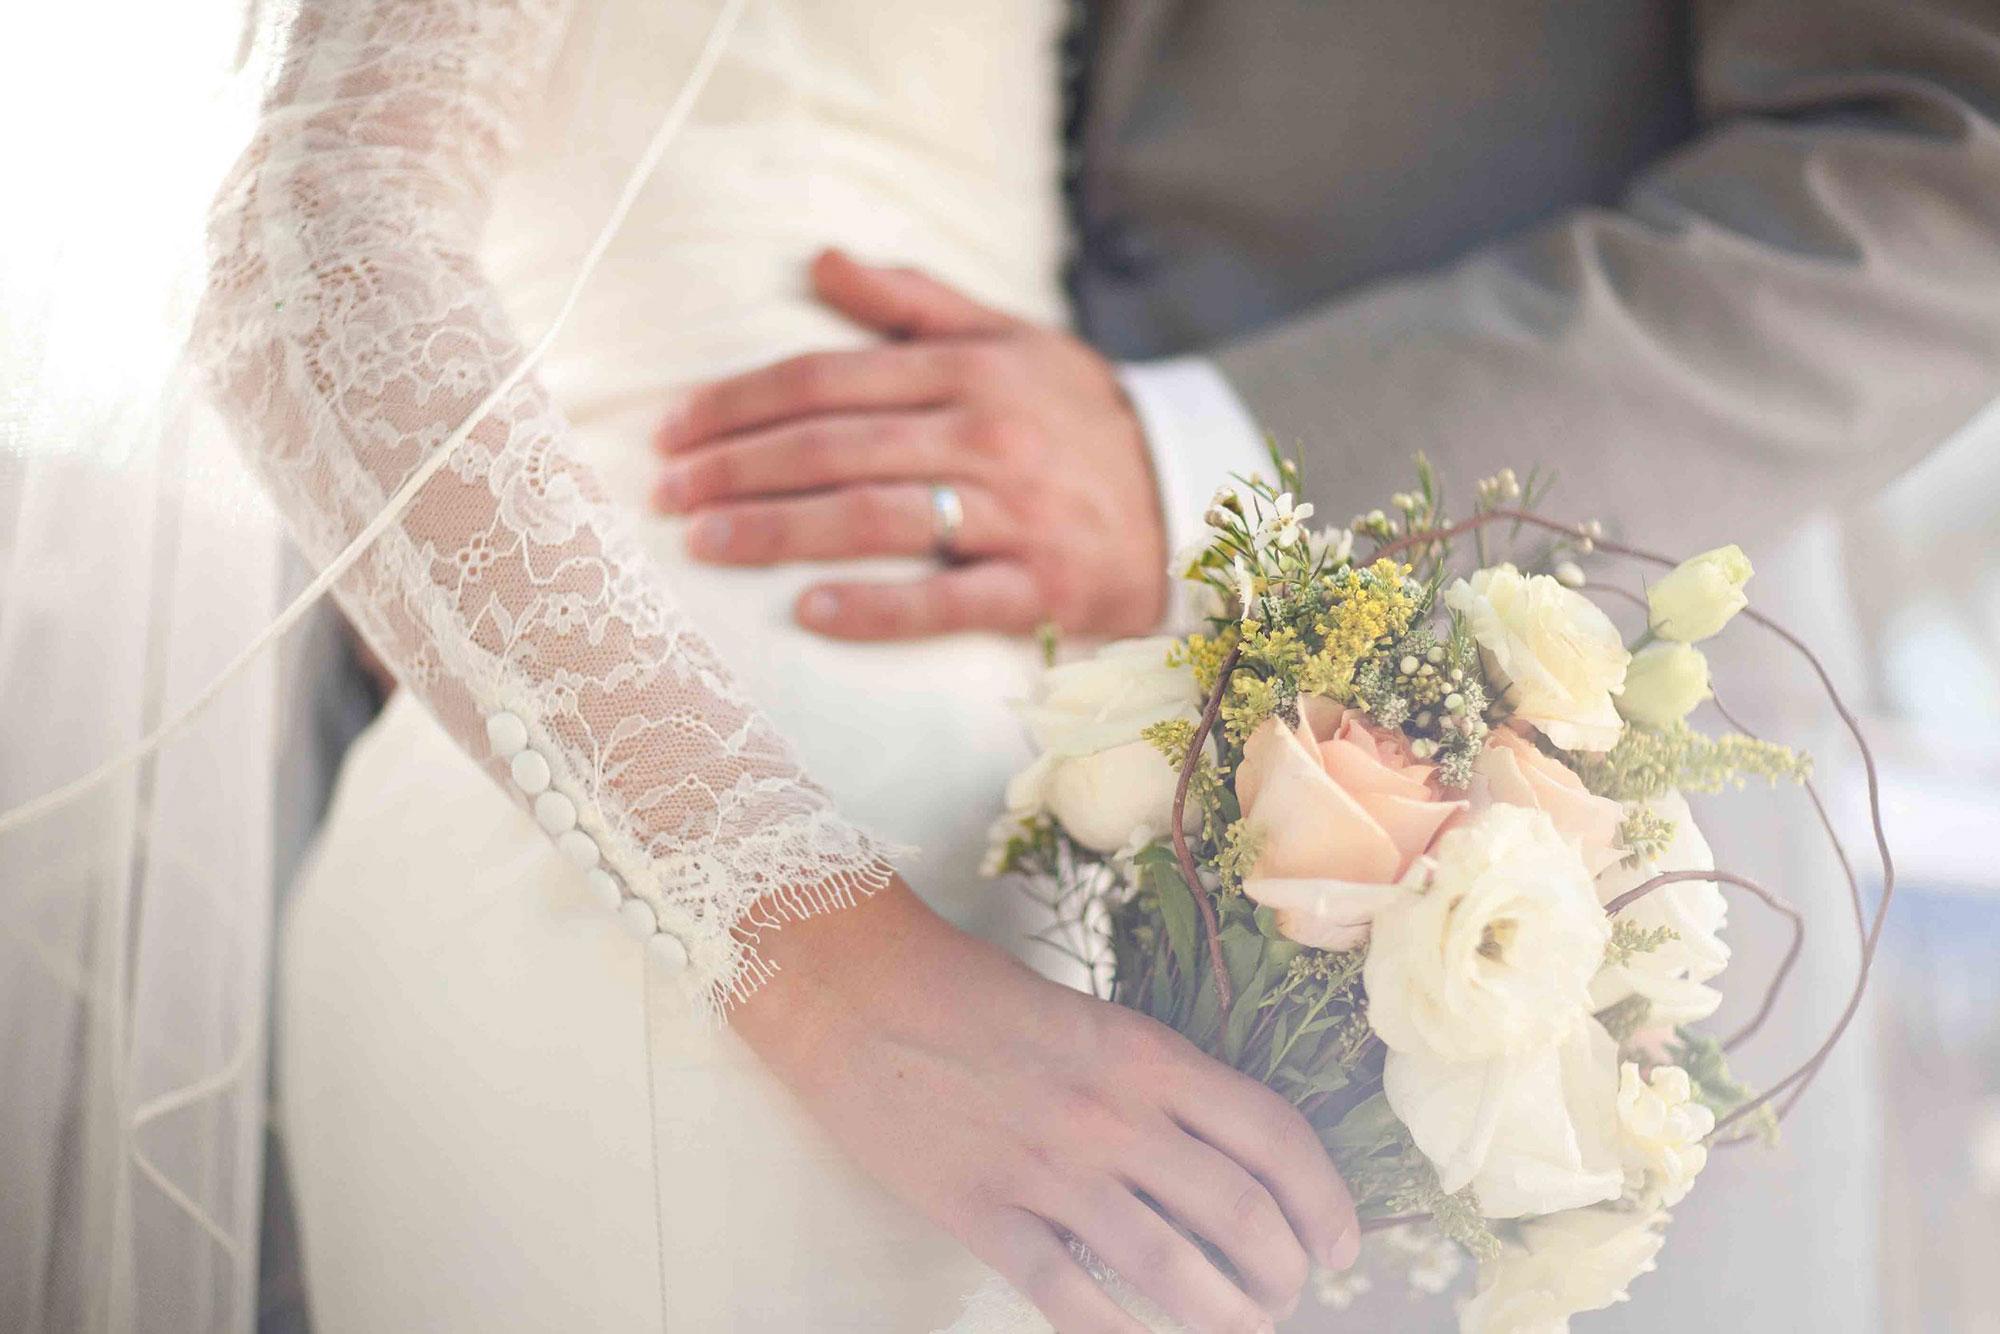 Amanda-Cowley-Willowbank-Vineyard-Bride-Photo-By-White-Photographie-015.jpg